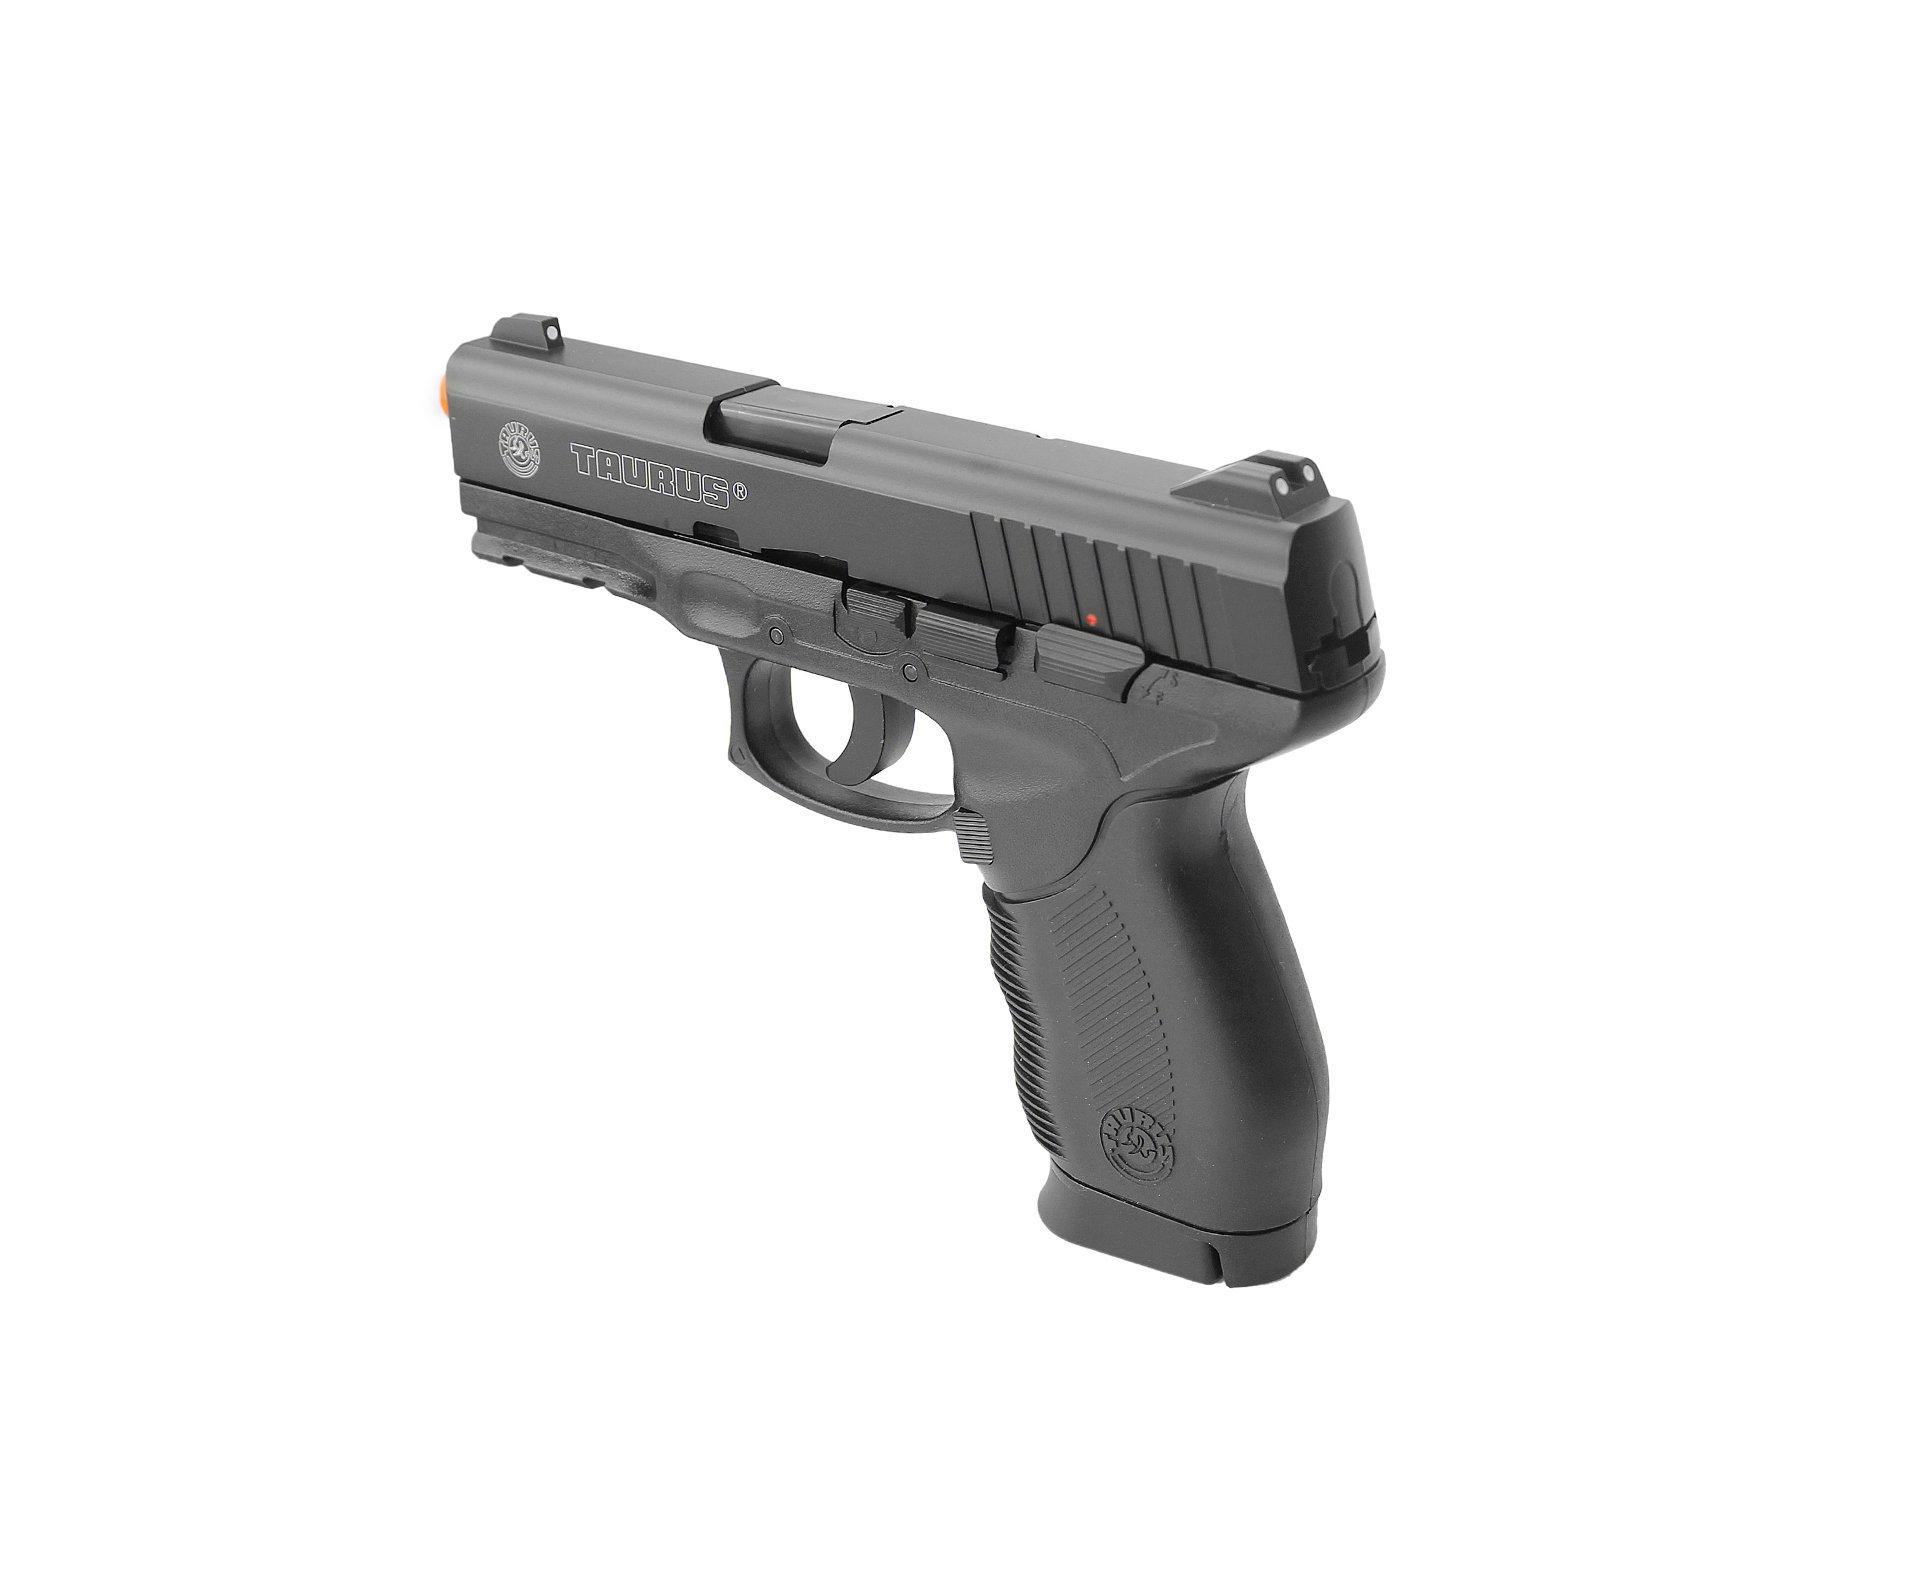 Pistola De Airsoft Gas Co2 Taurus Pt 24/7 Cal 6,0mm Cybergun